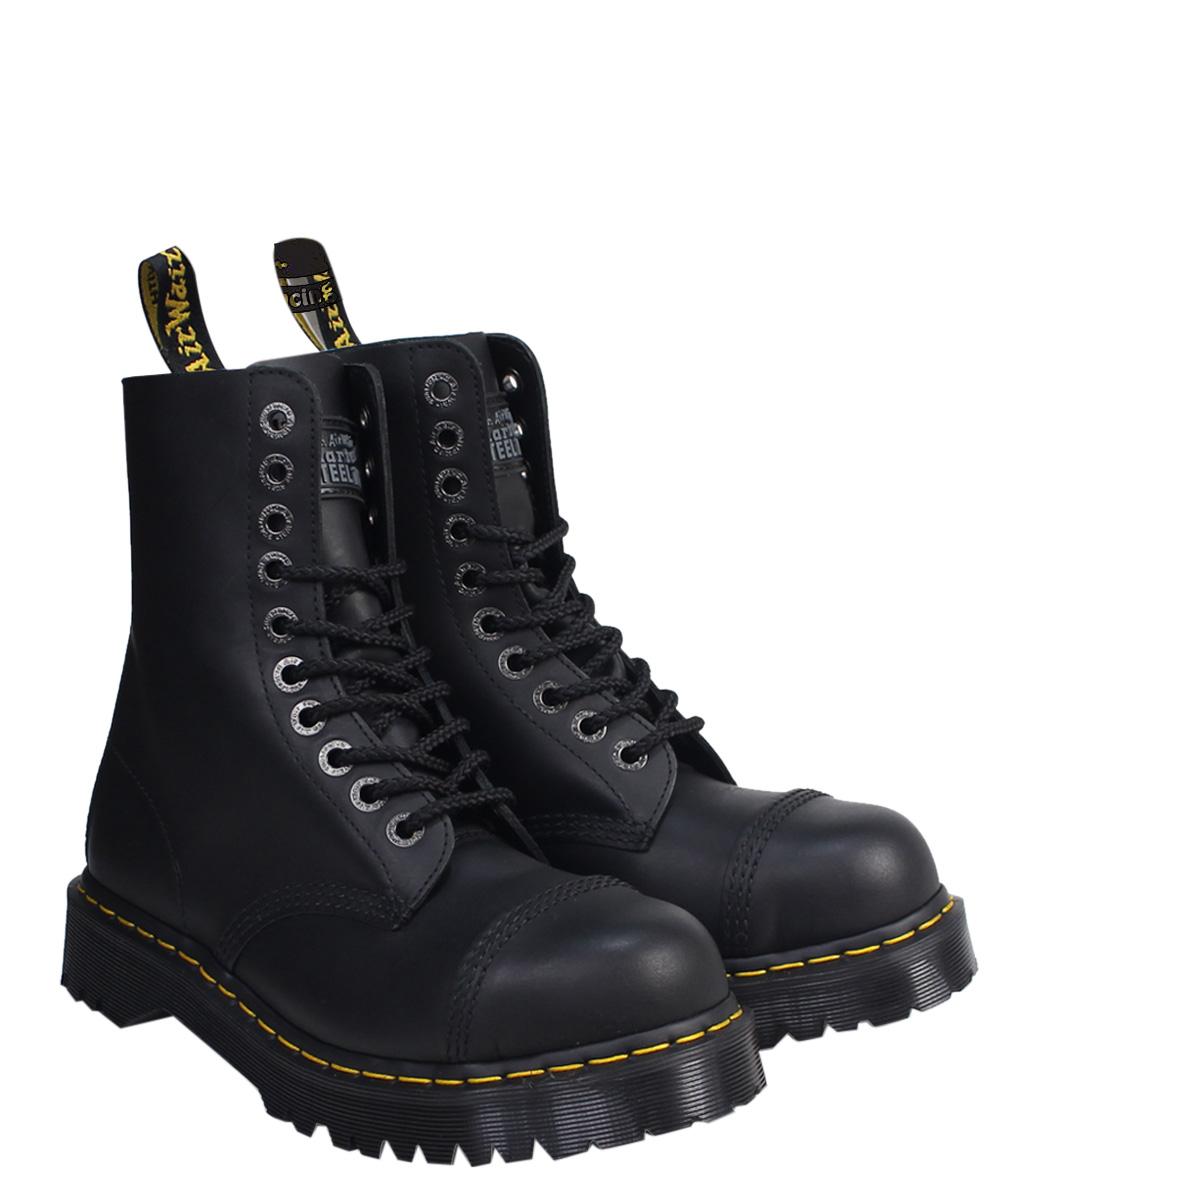 Dr.Martens ドクターマーチン 8761 10ホール ブーツ 10EYE BOOT R10966001 メンズ レディース